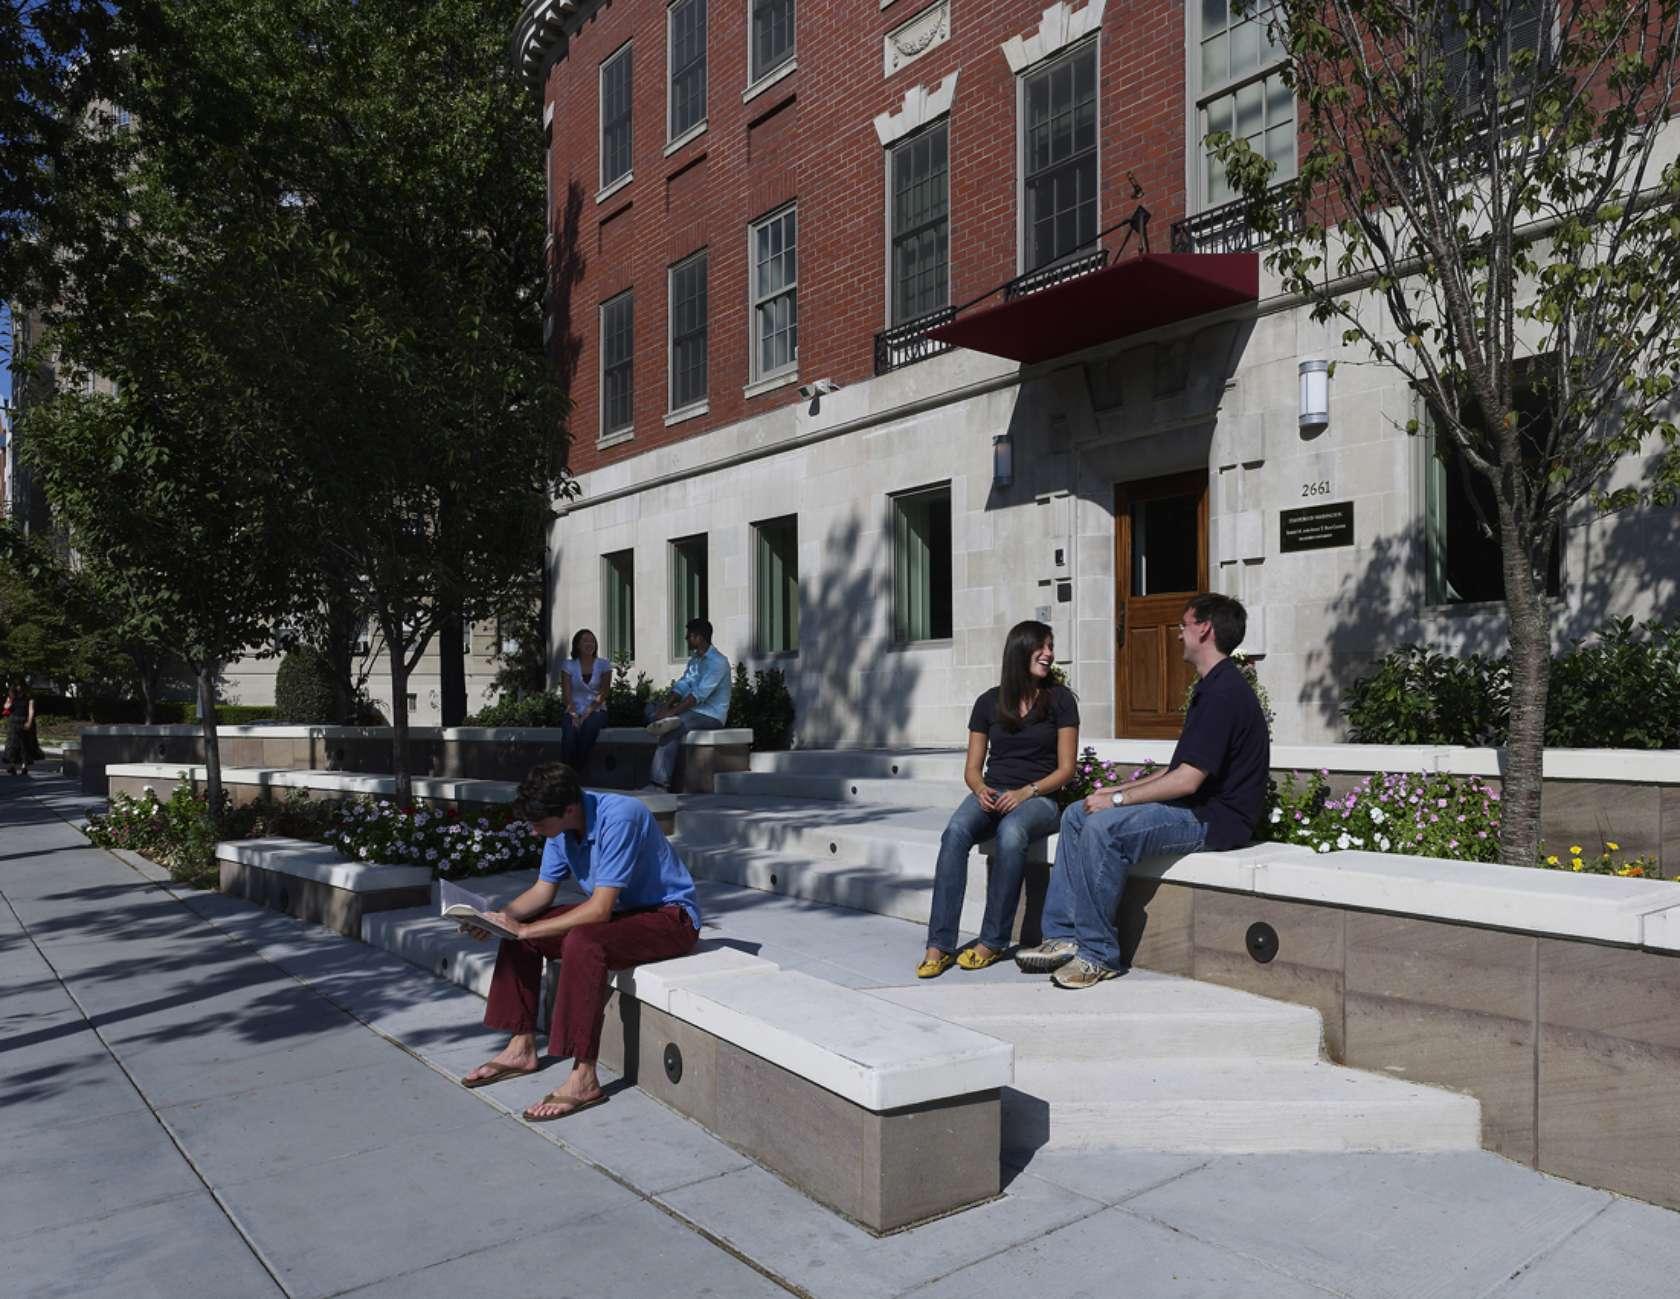 landscape architecture bureau lab architizer. Black Bedroom Furniture Sets. Home Design Ideas